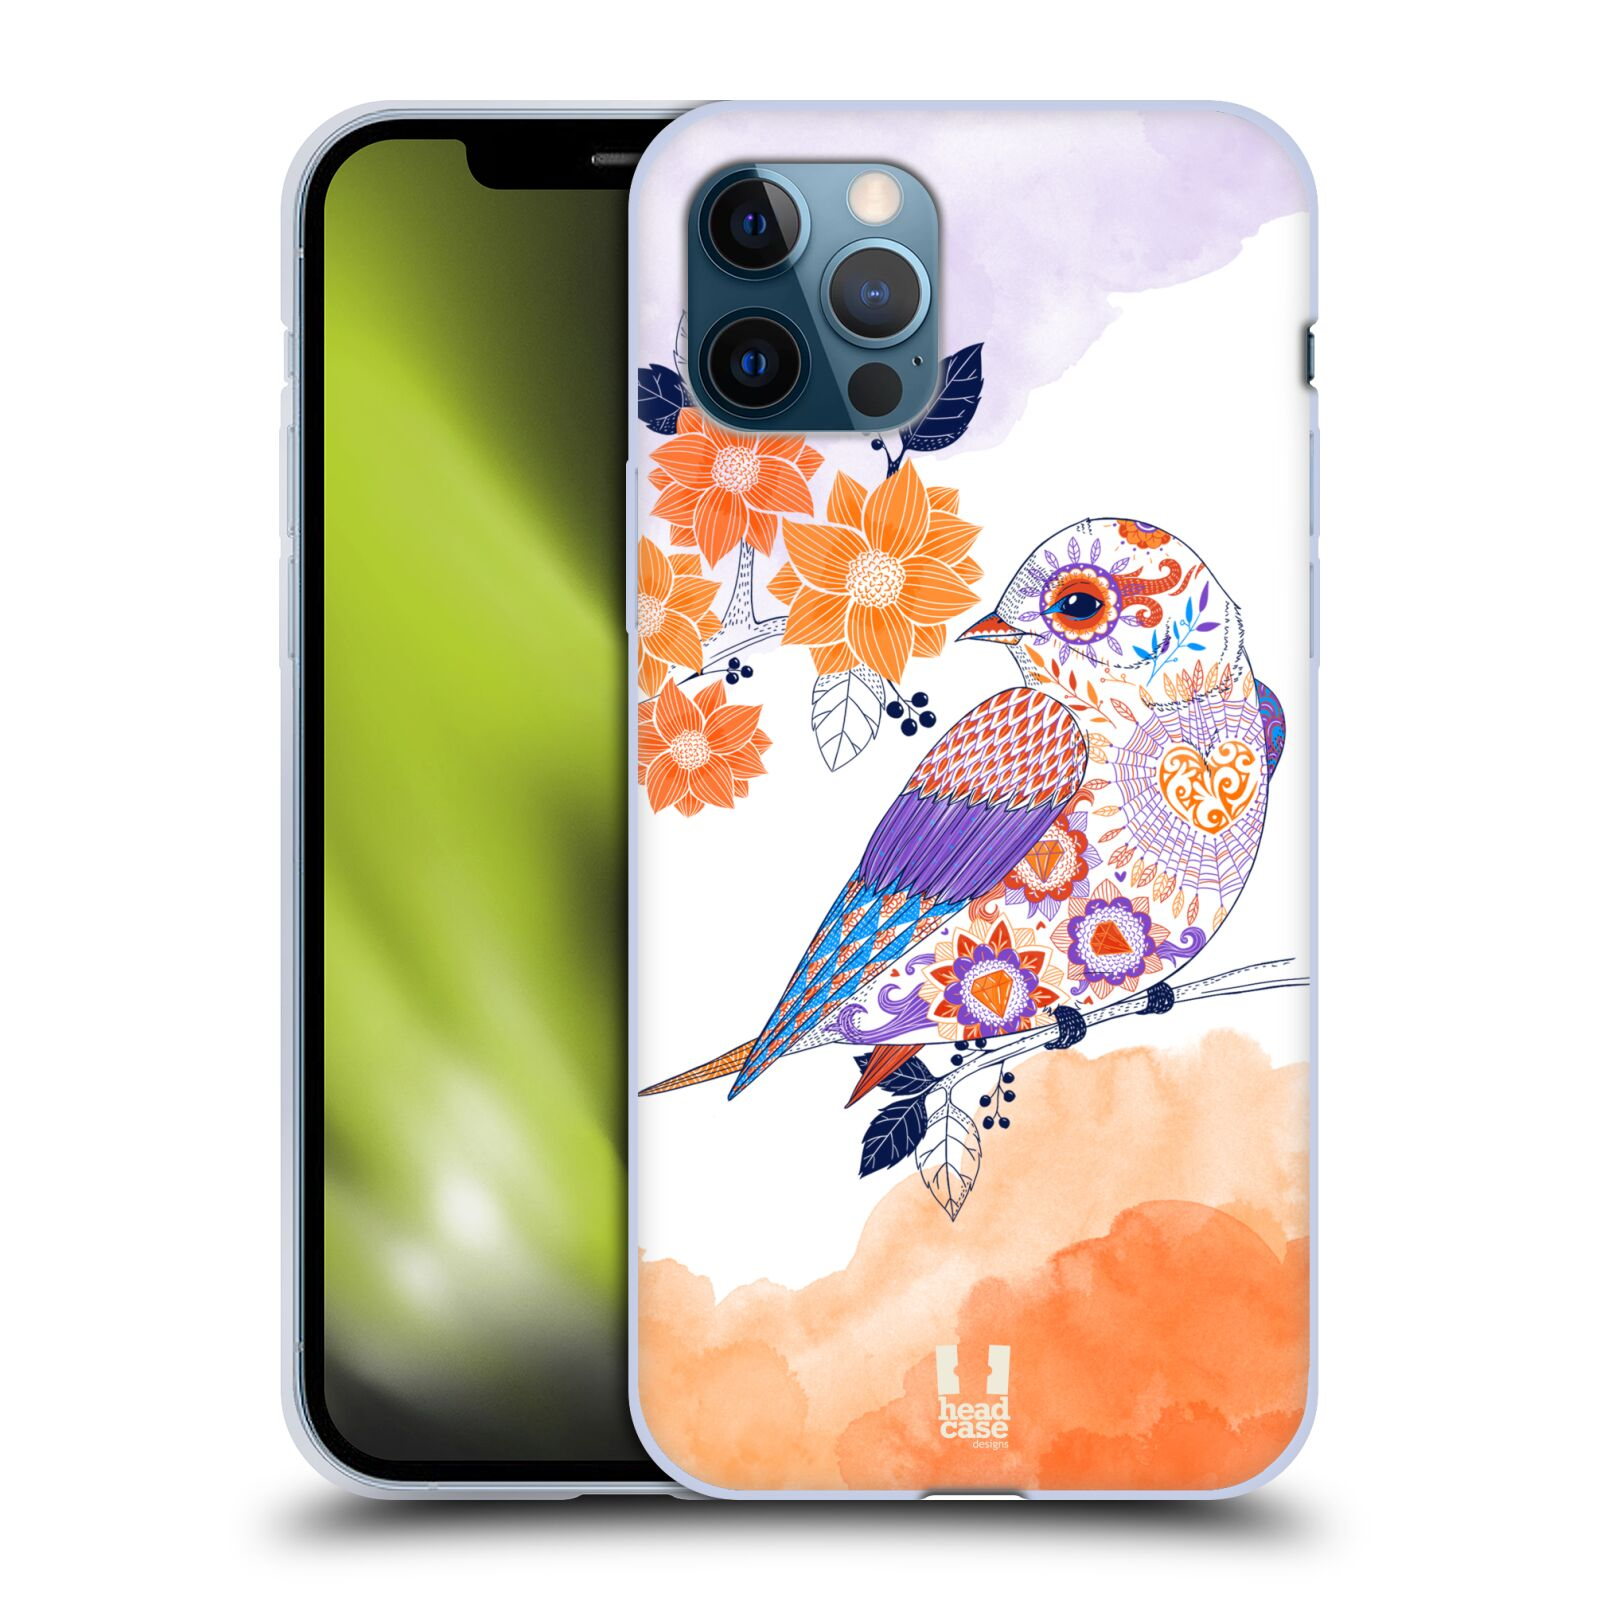 Silikonové pouzdro na mobil Apple iPhone 12 / 12 Pro - Head Case - PTÁČEK TANGERINE